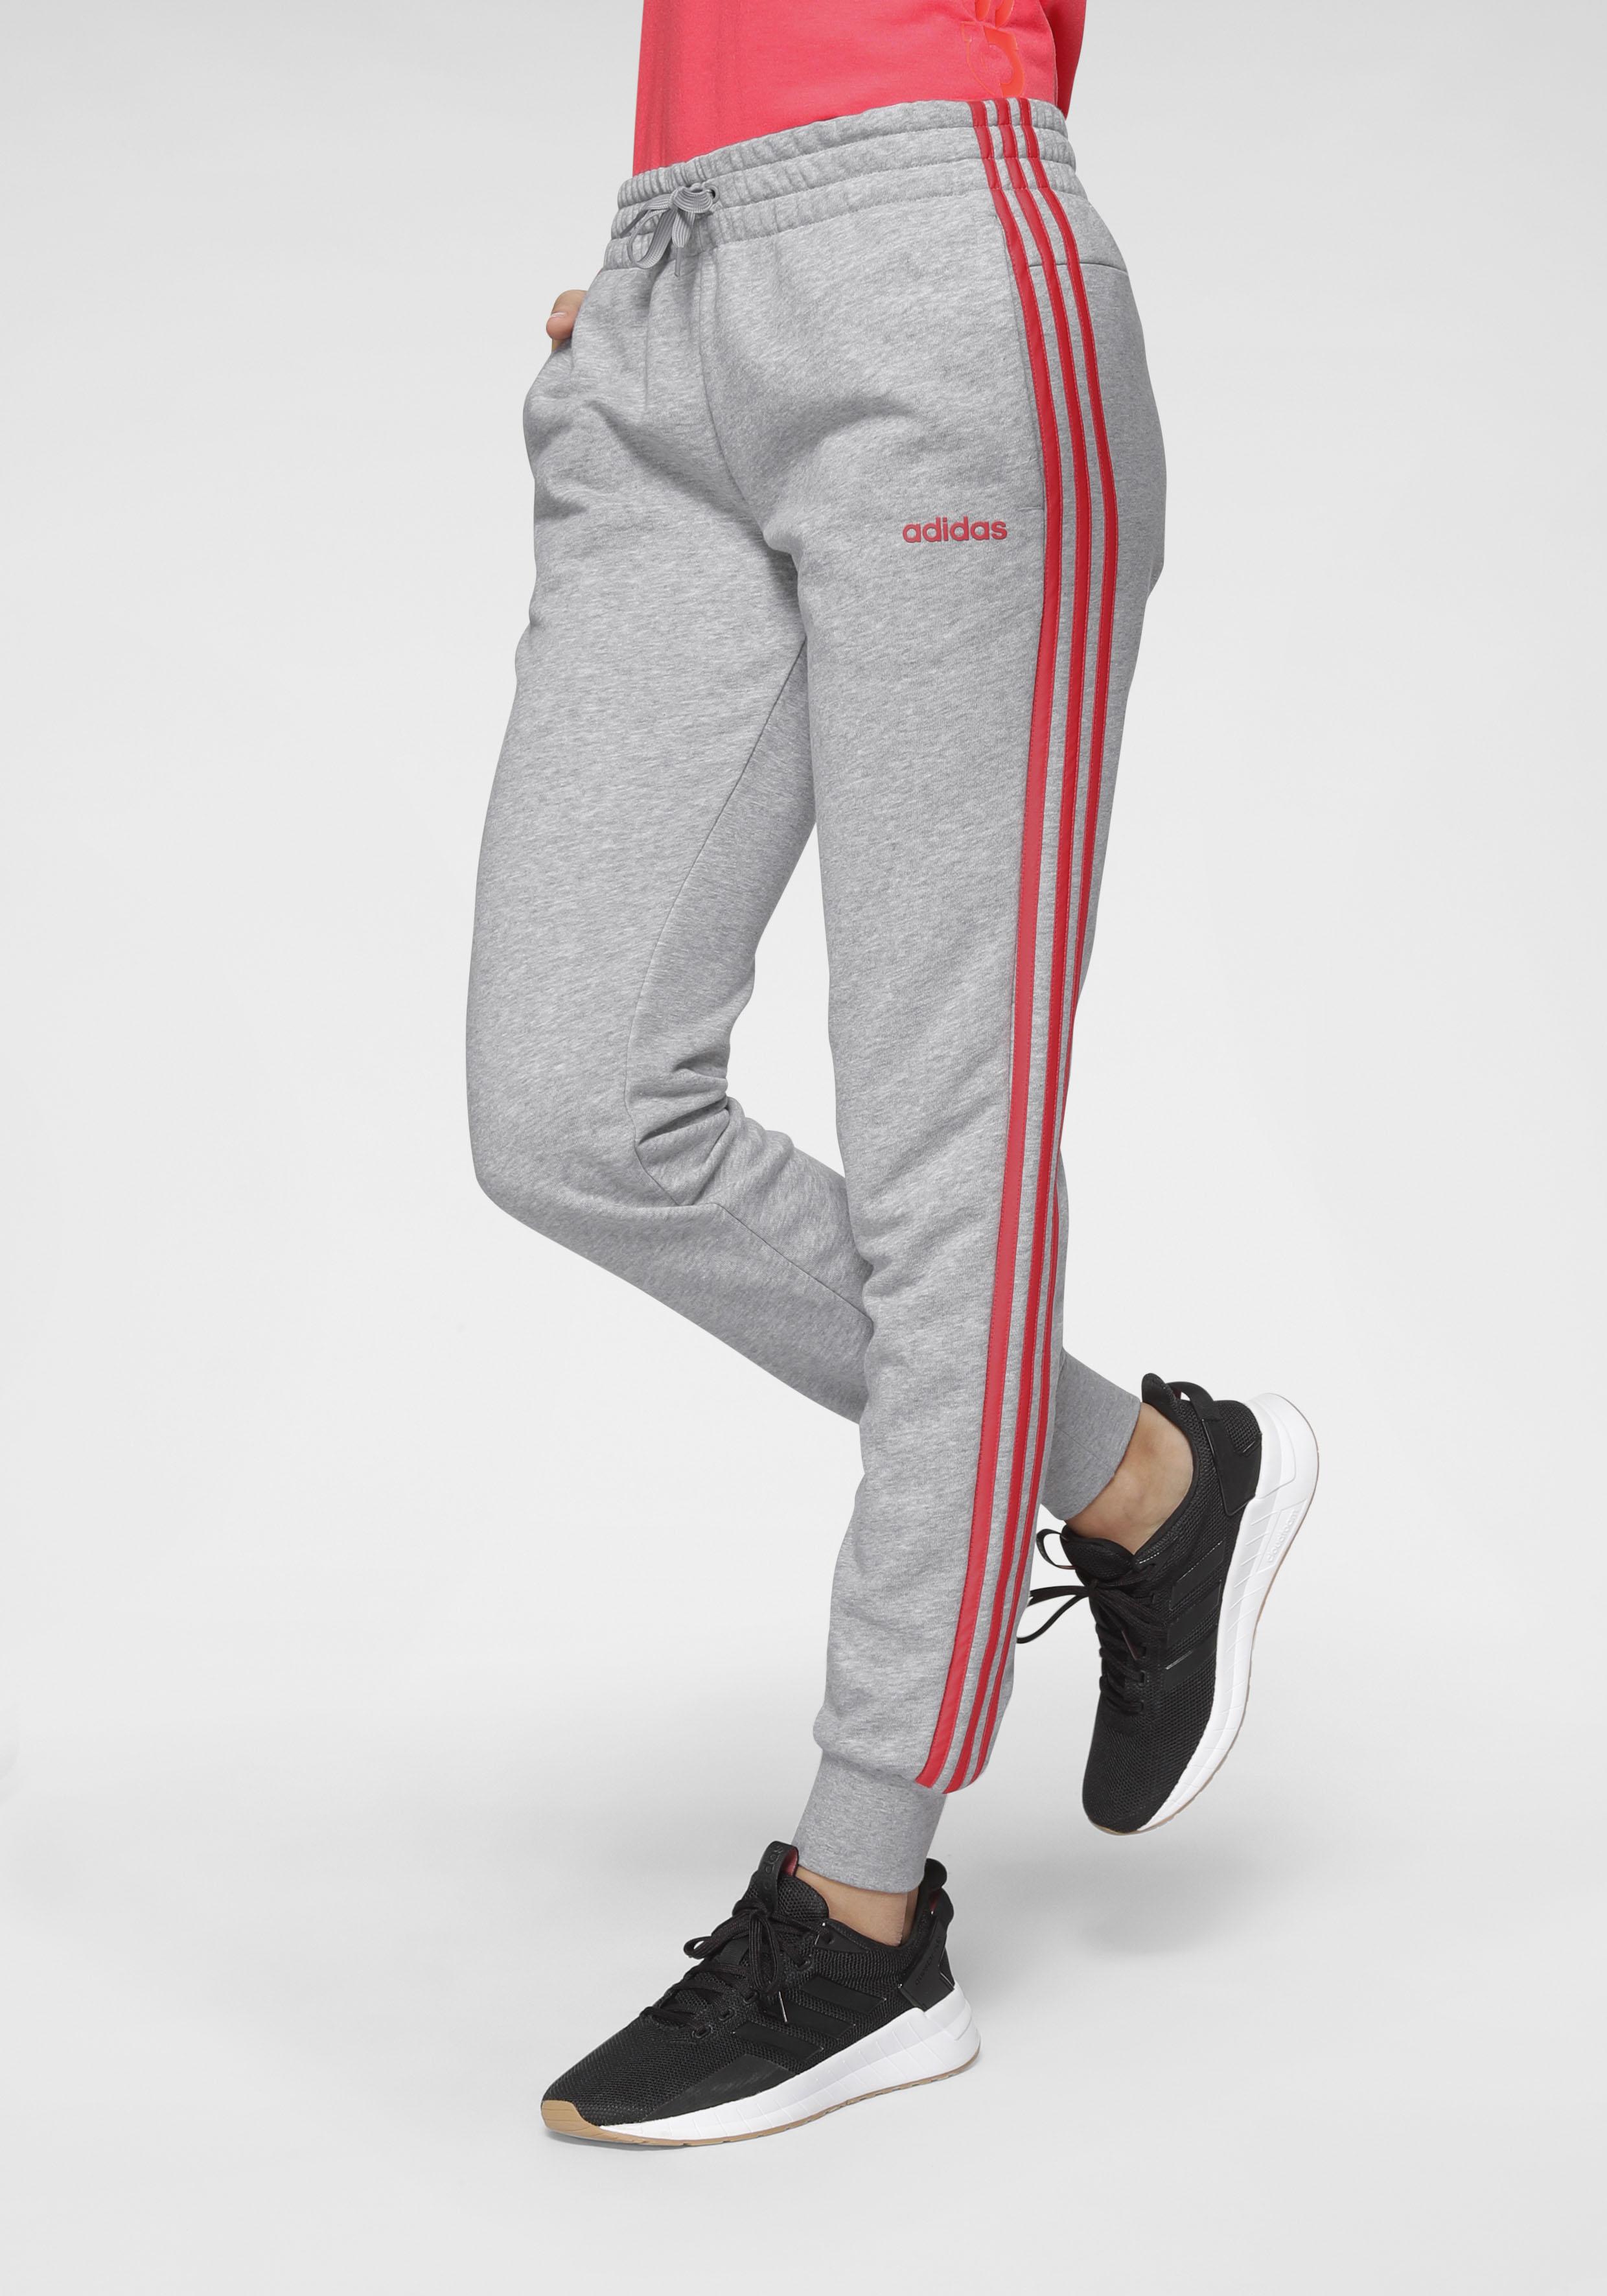 adidas -  Jogginghose 3 STRIPES PANT